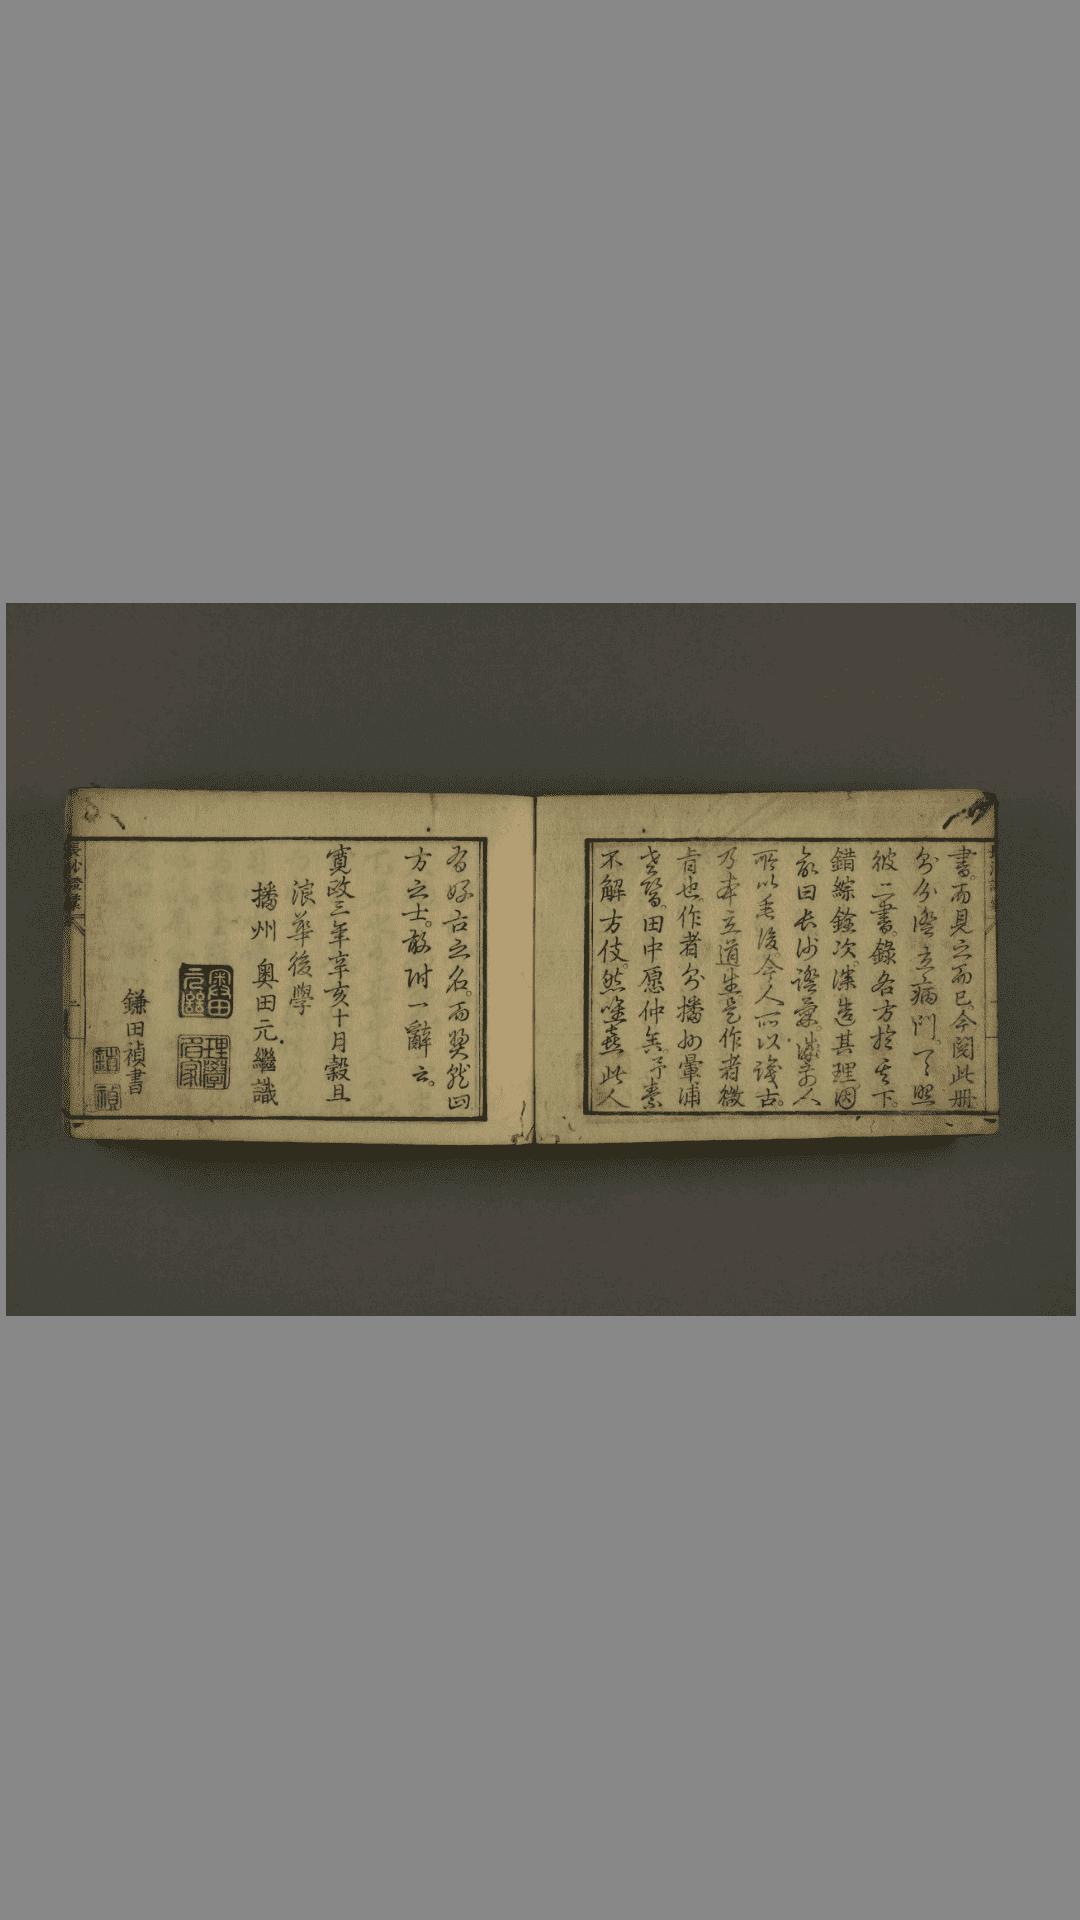 "title=""(汉籍医方)长沙正经证汇"